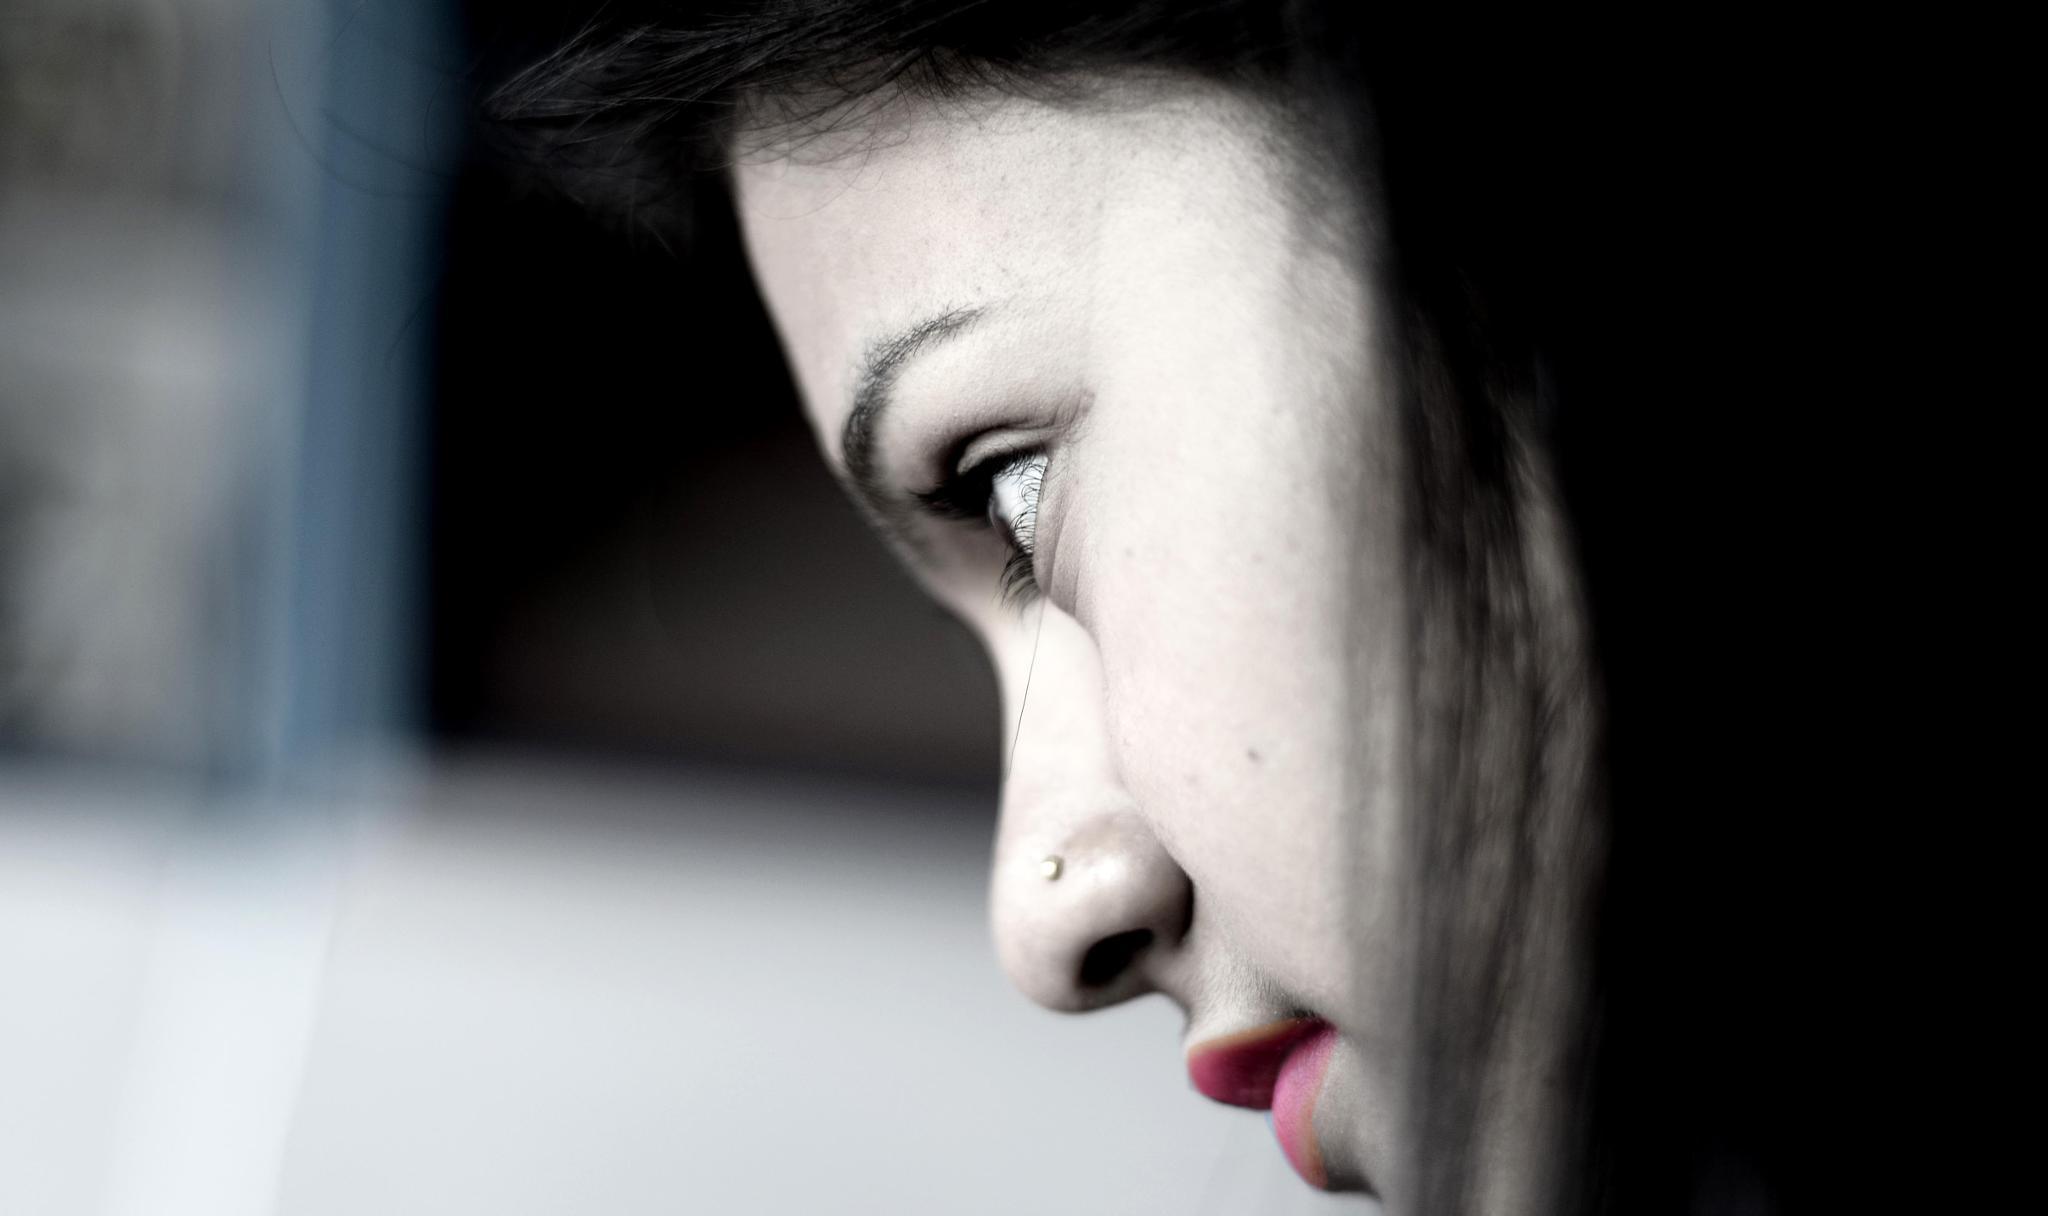 Red lips & Eye by Shekhar Rapacha